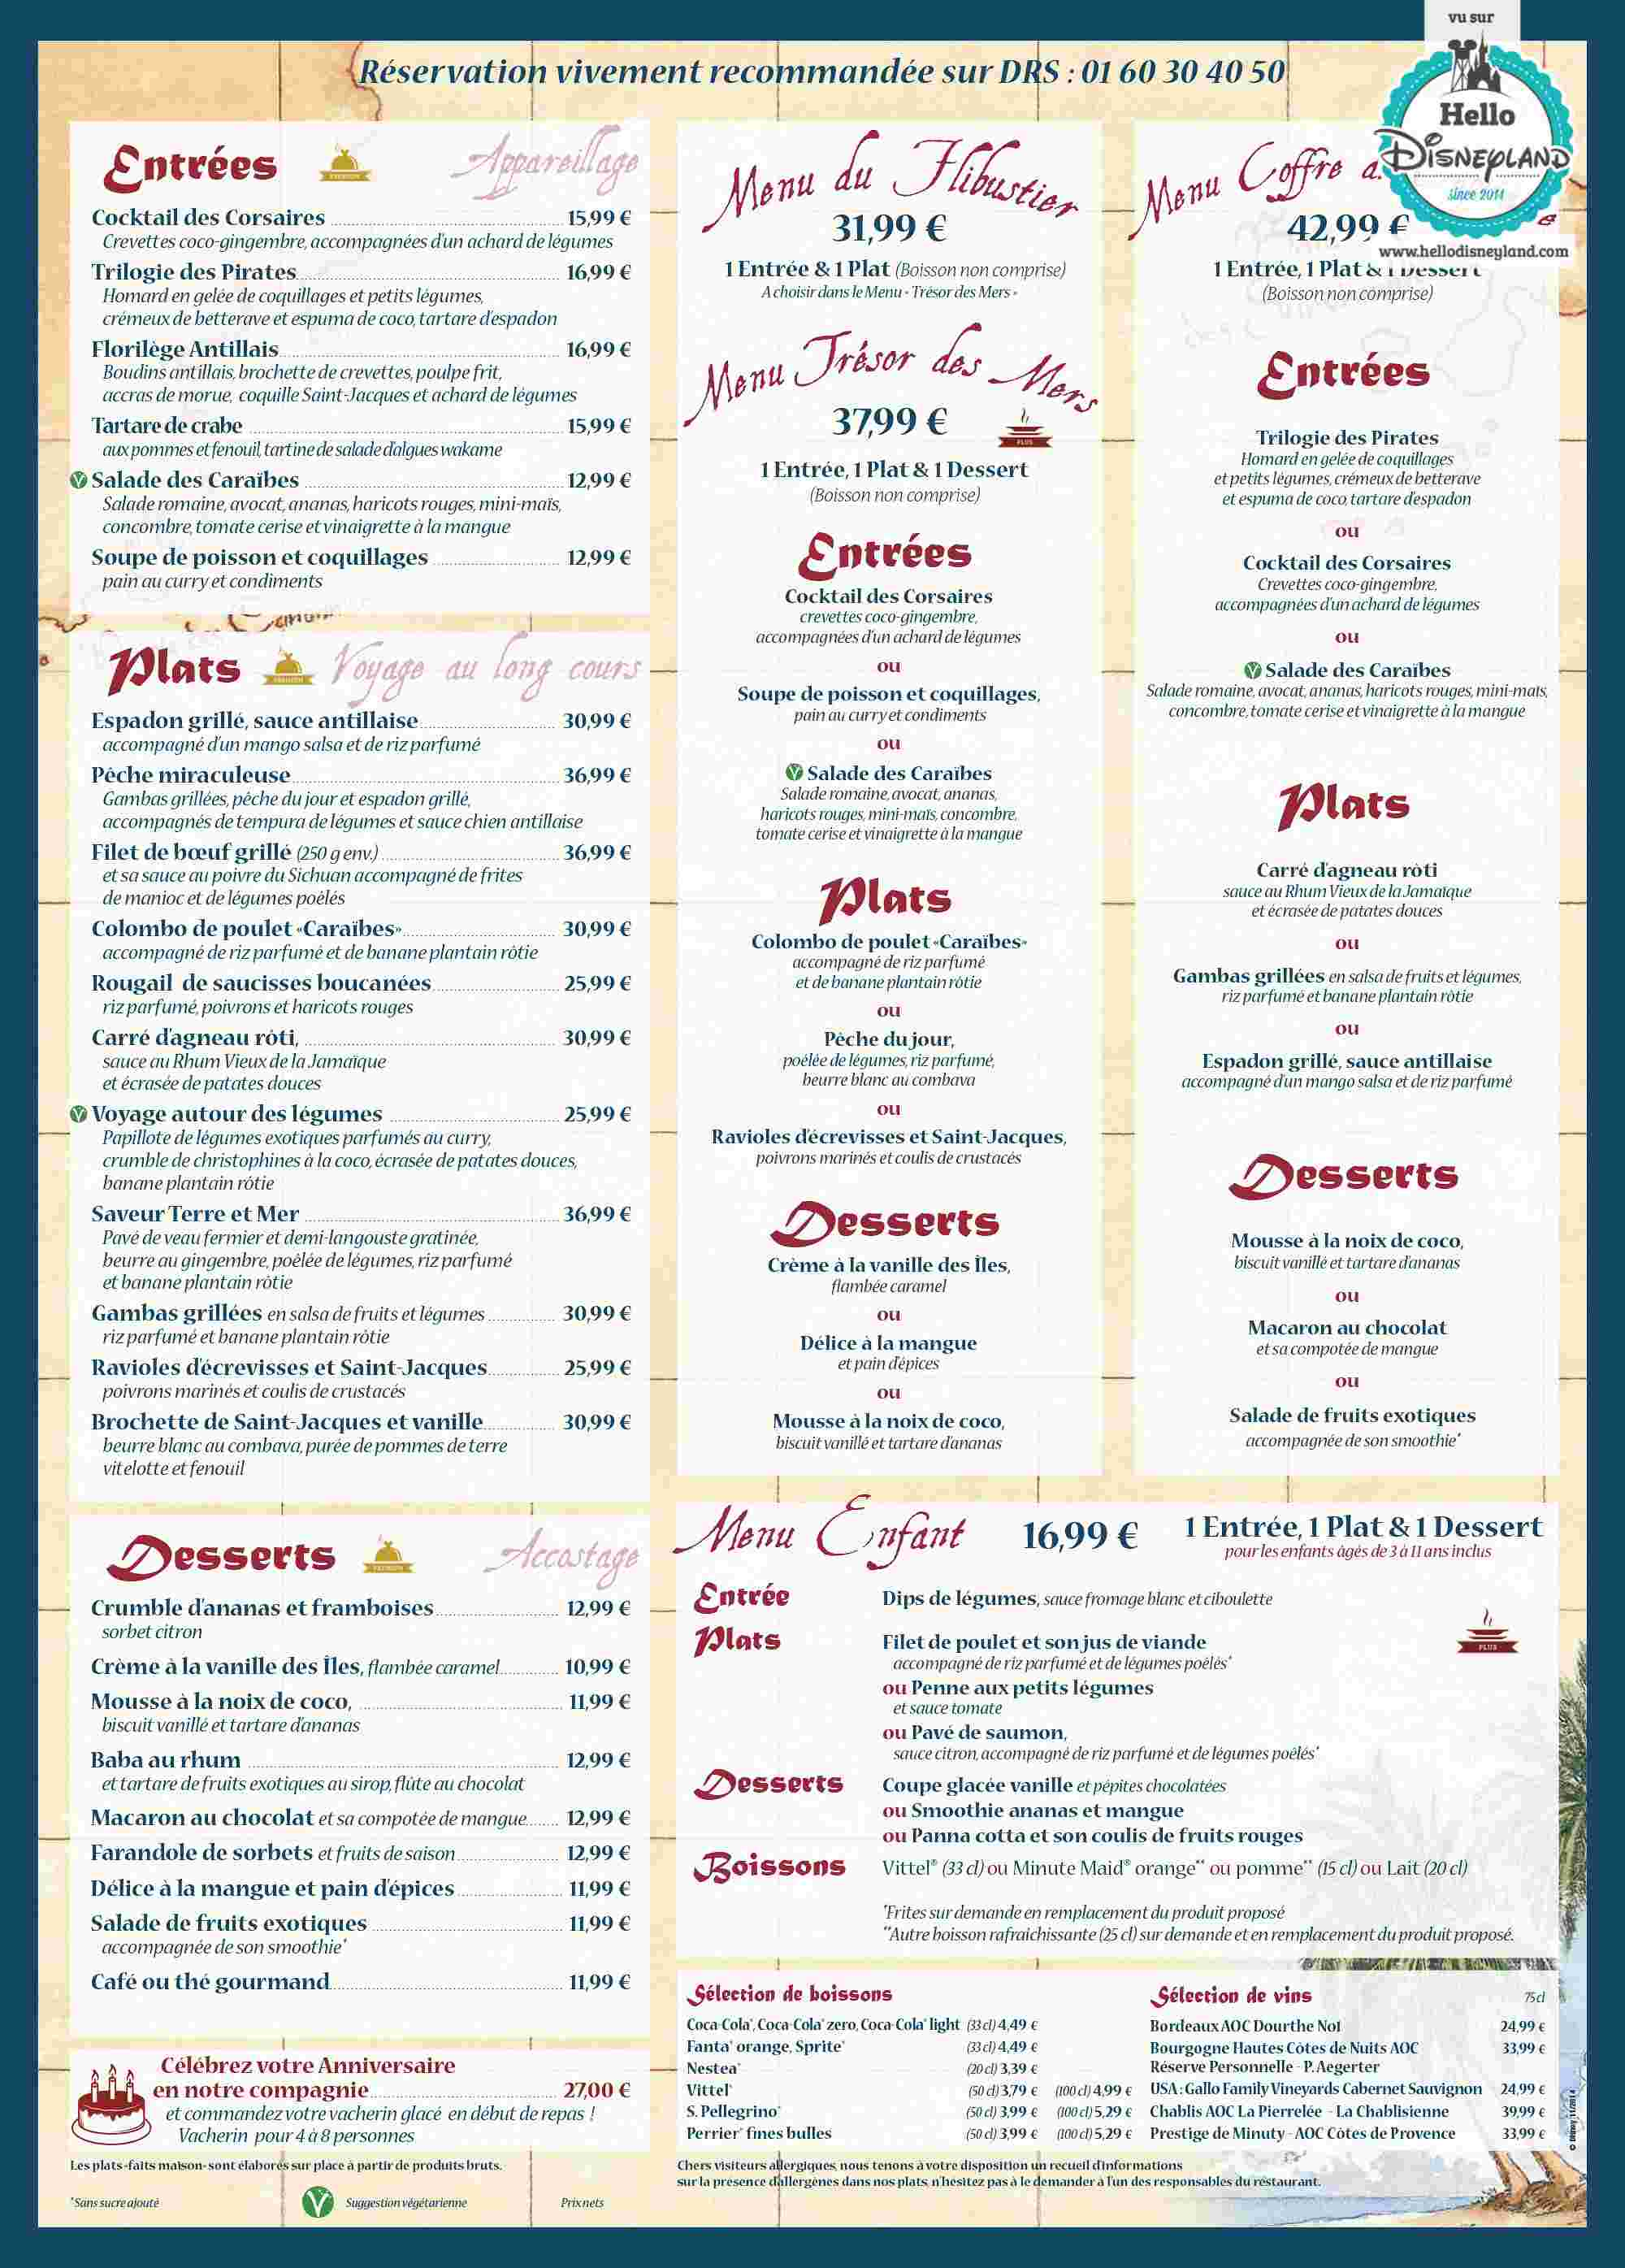 Adventureland :: Captain Jack's - Restaurant des Pirates - Pagina 22 Menu-r13